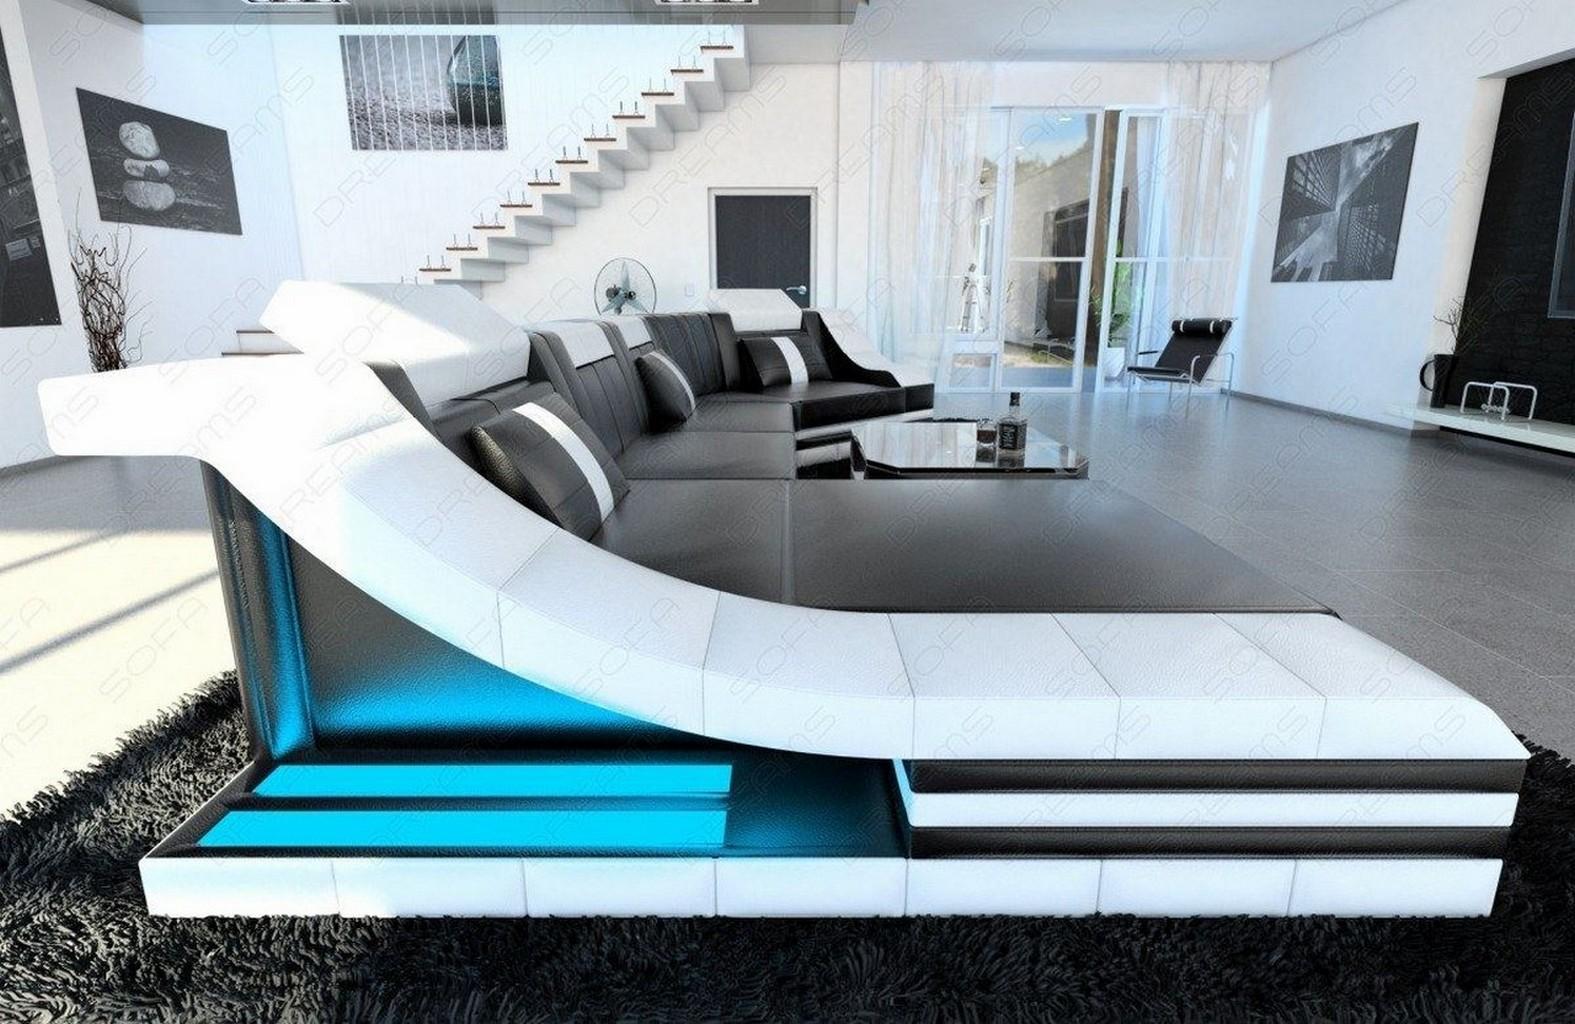 luxus wohnlandschaft turino c form sofa mit led beleuchtung recamiere ledercouch ebay. Black Bedroom Furniture Sets. Home Design Ideas